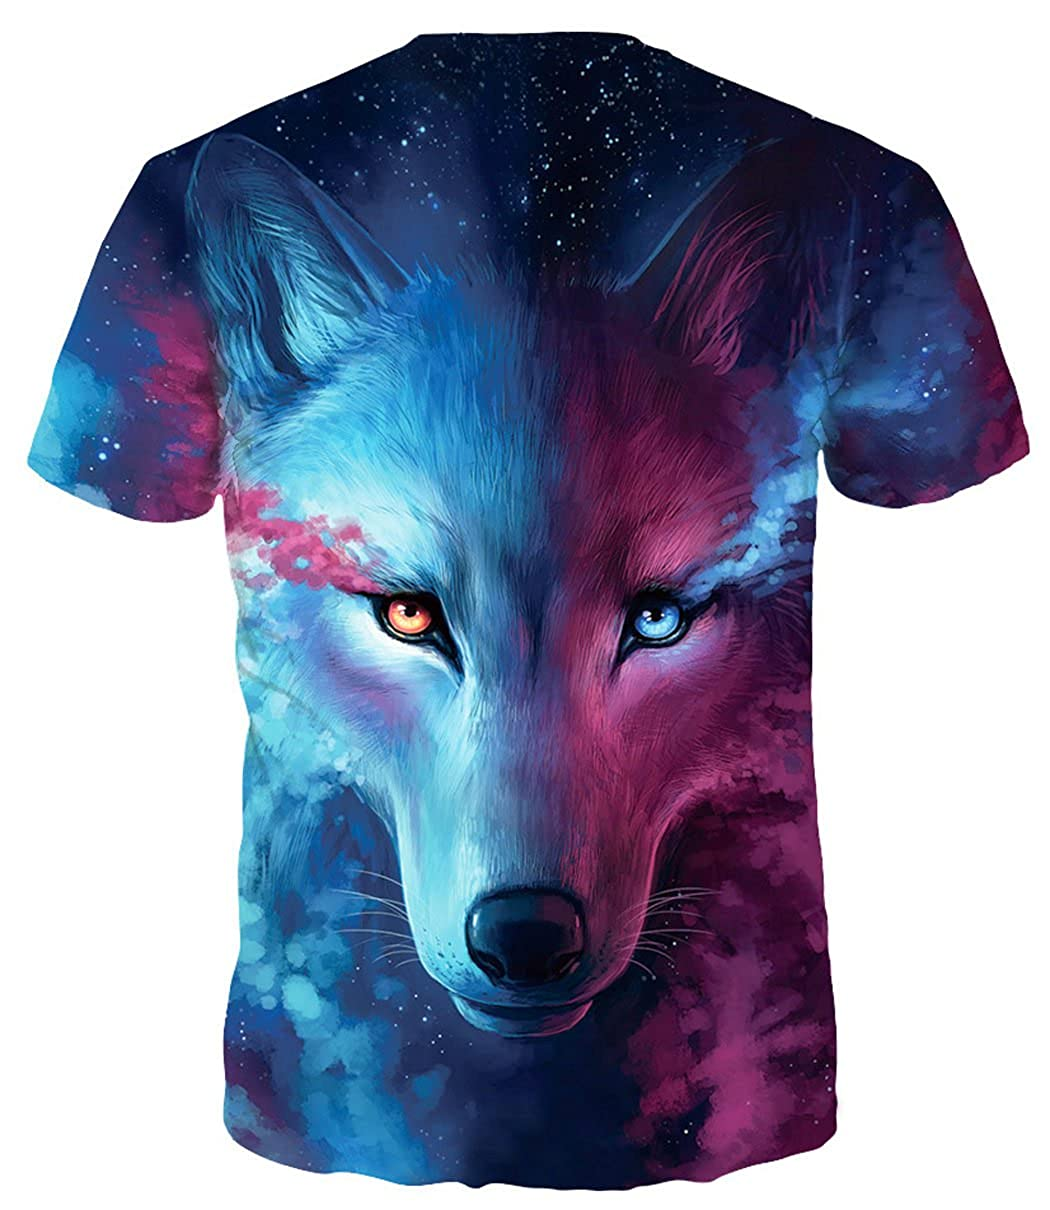 a3f8dedc0 Amazon.com  HOP FASHION Unisex Short Sleeve 3D Print T Shirts  Clothing